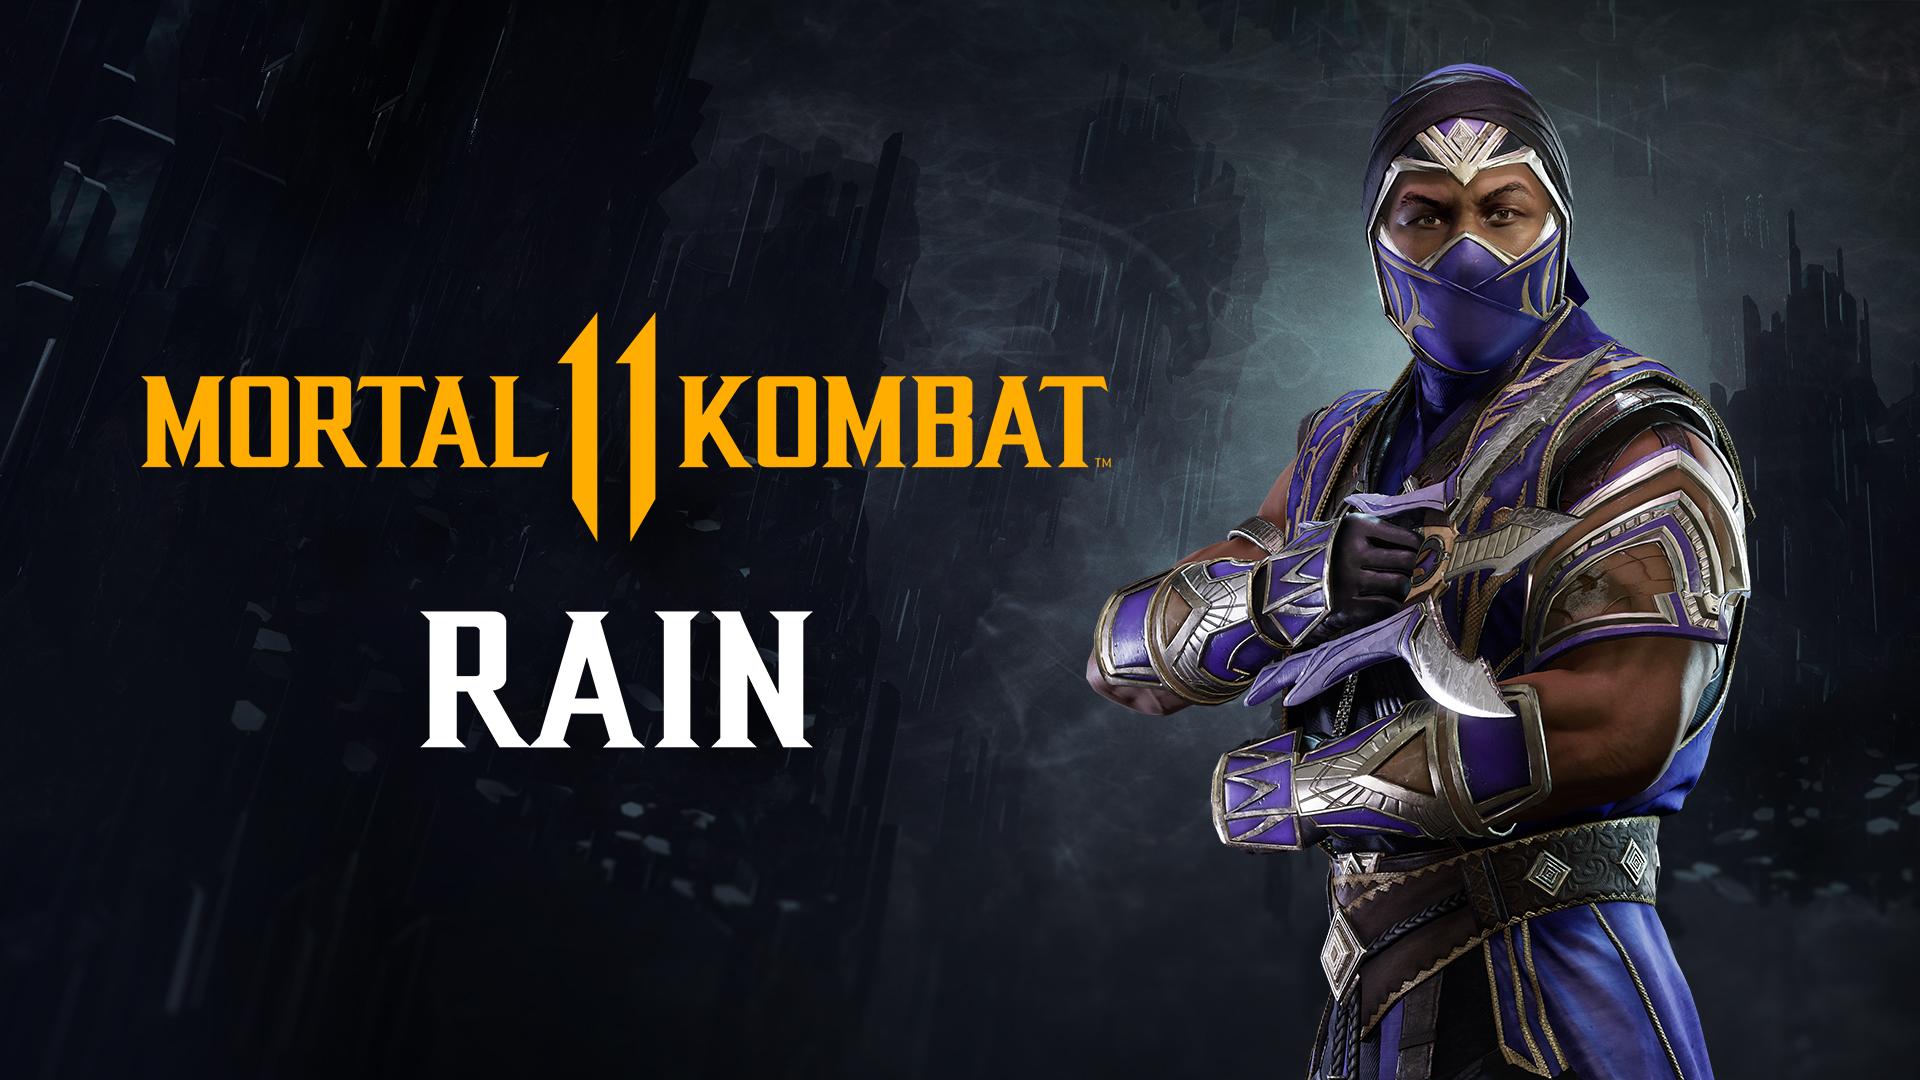 New Mortal Kombat 11 Ultimate Gameplay Trailer Showcases The Return Of The Divine Demigod – Rain